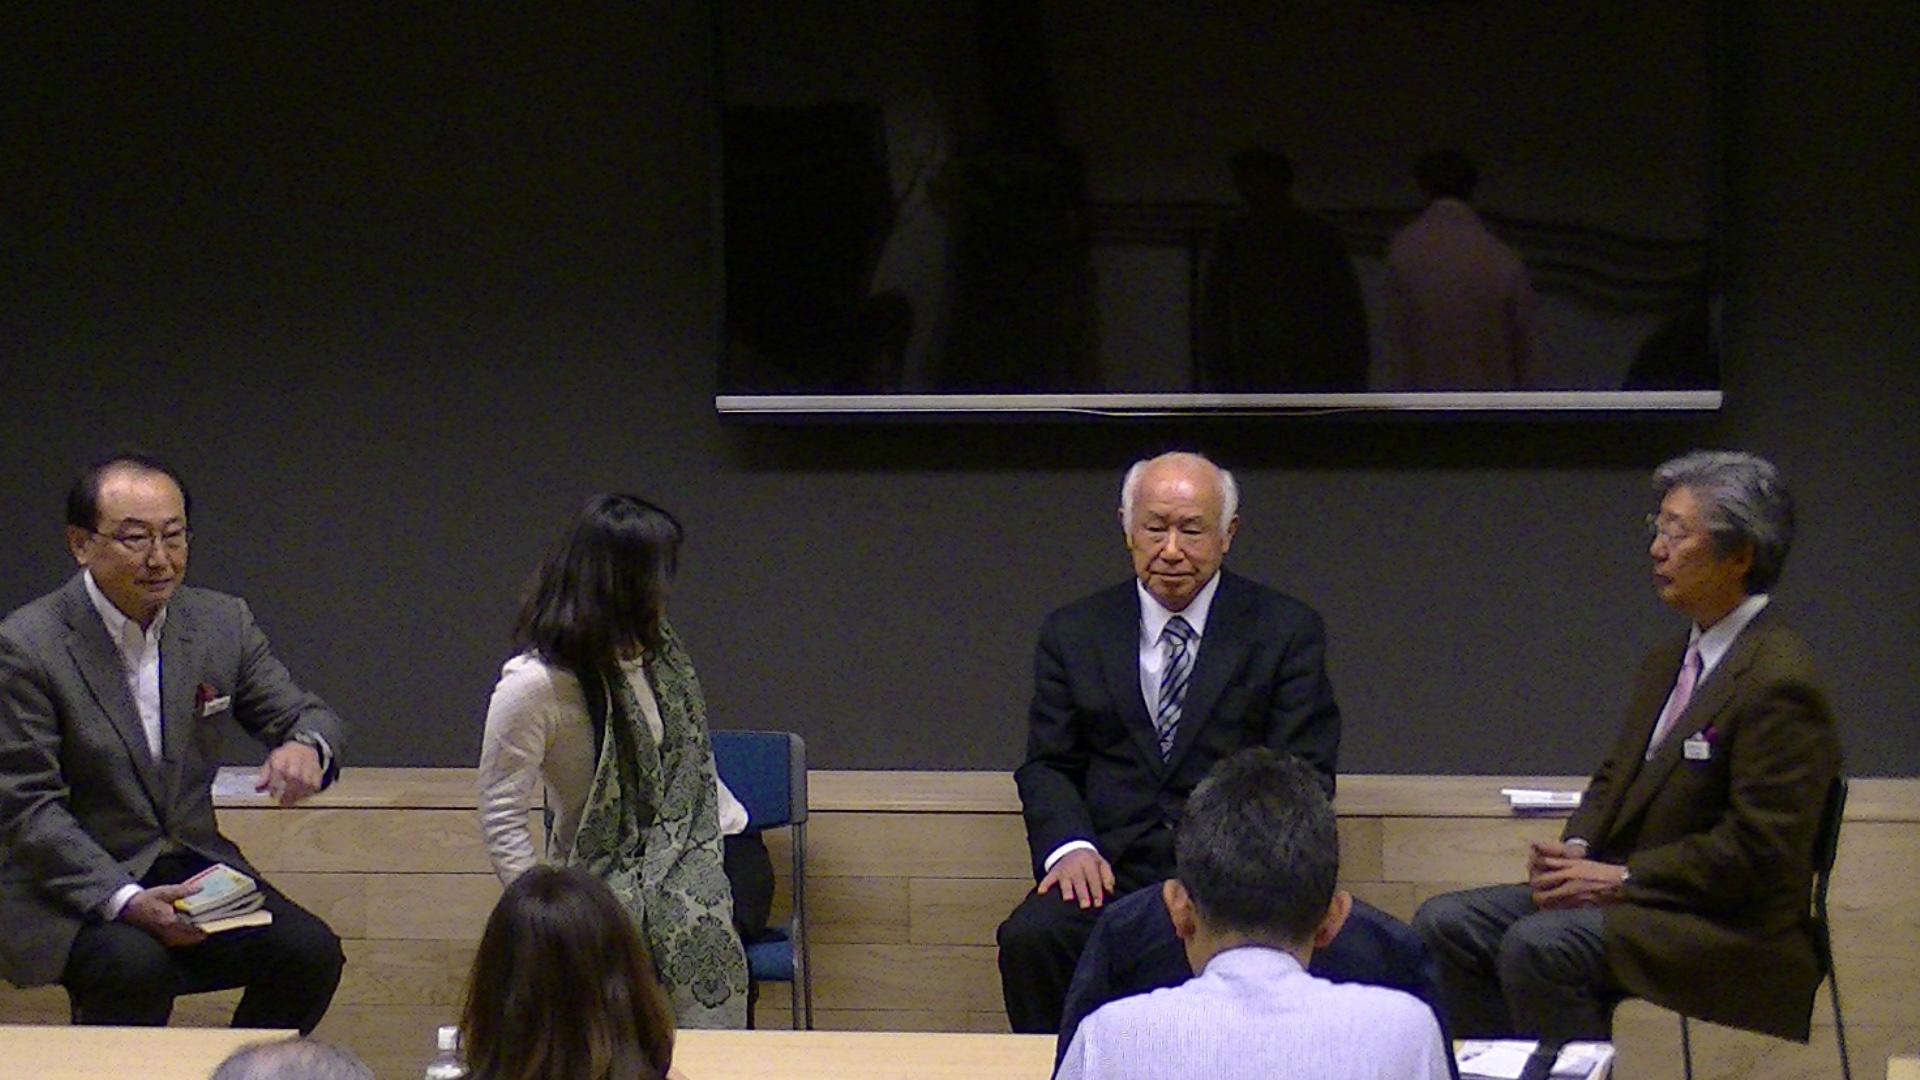 PIC 0541 - 4月1日東京思風塾の開催になります。